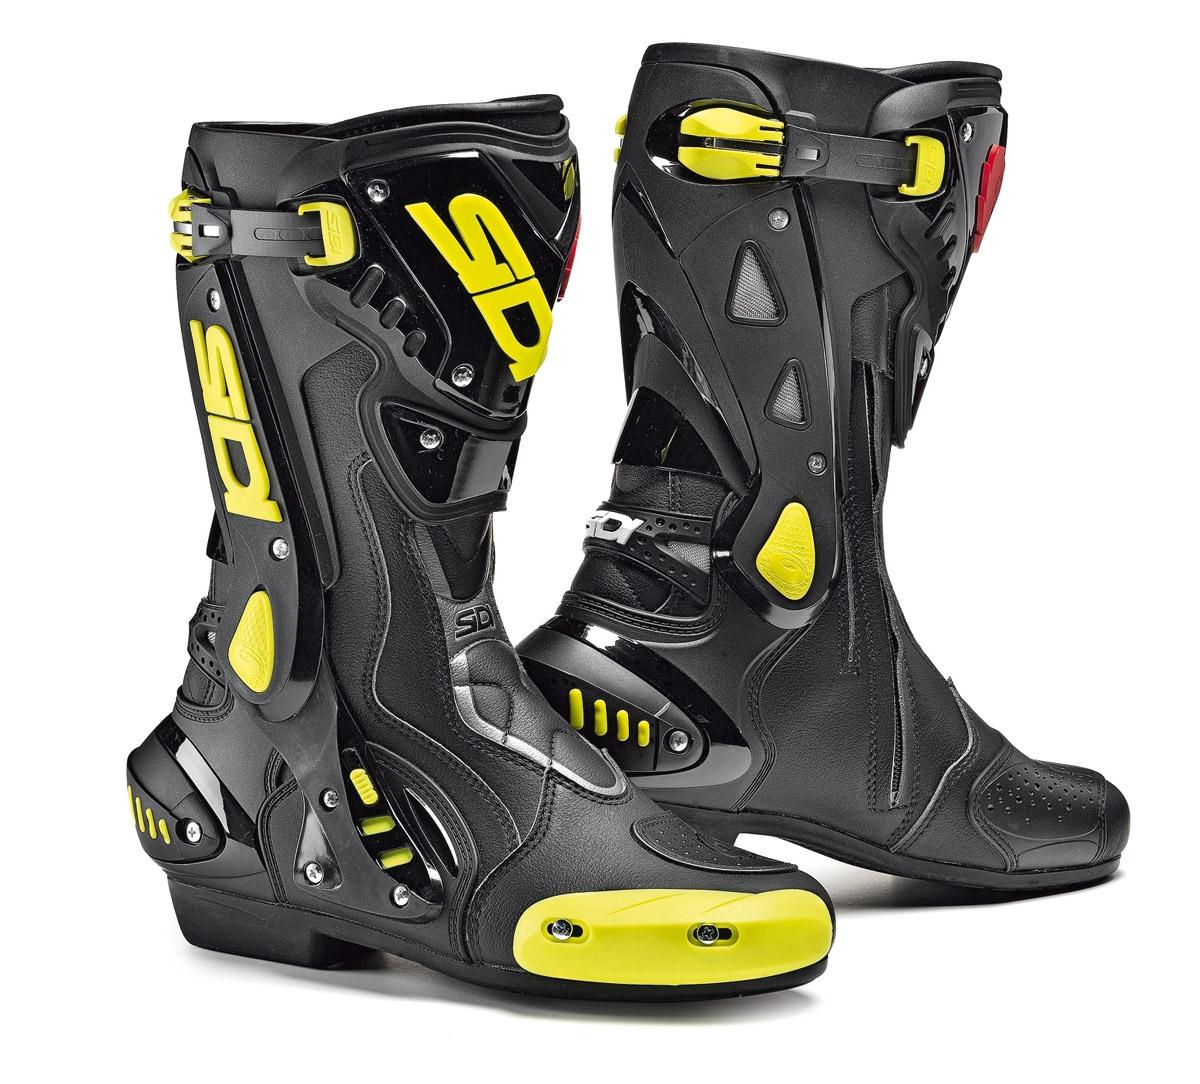 7e0163cc19b628 Sidi-ST-racing-stiefel-motorradstiefel-boot-renngrib-motorrad-neon-gelb.jpg